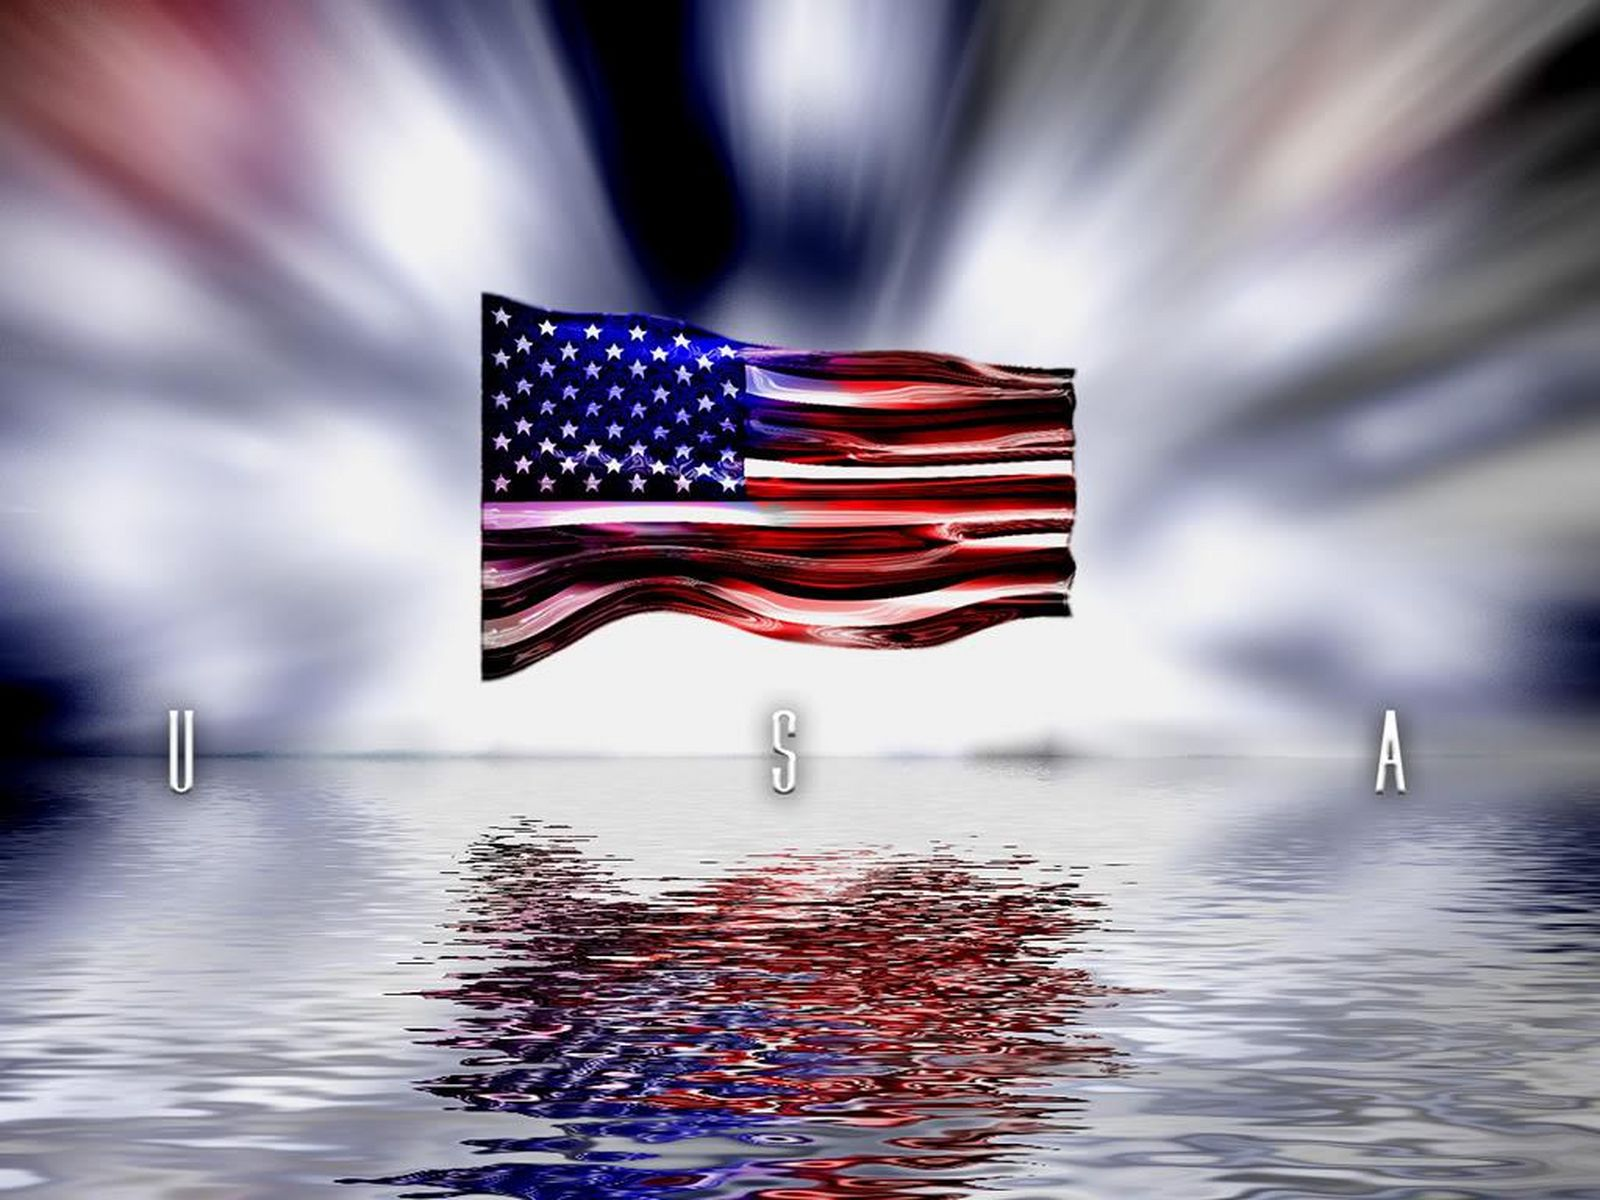 Patriotic Background Images   Desktop Backgrounds 1600x1200